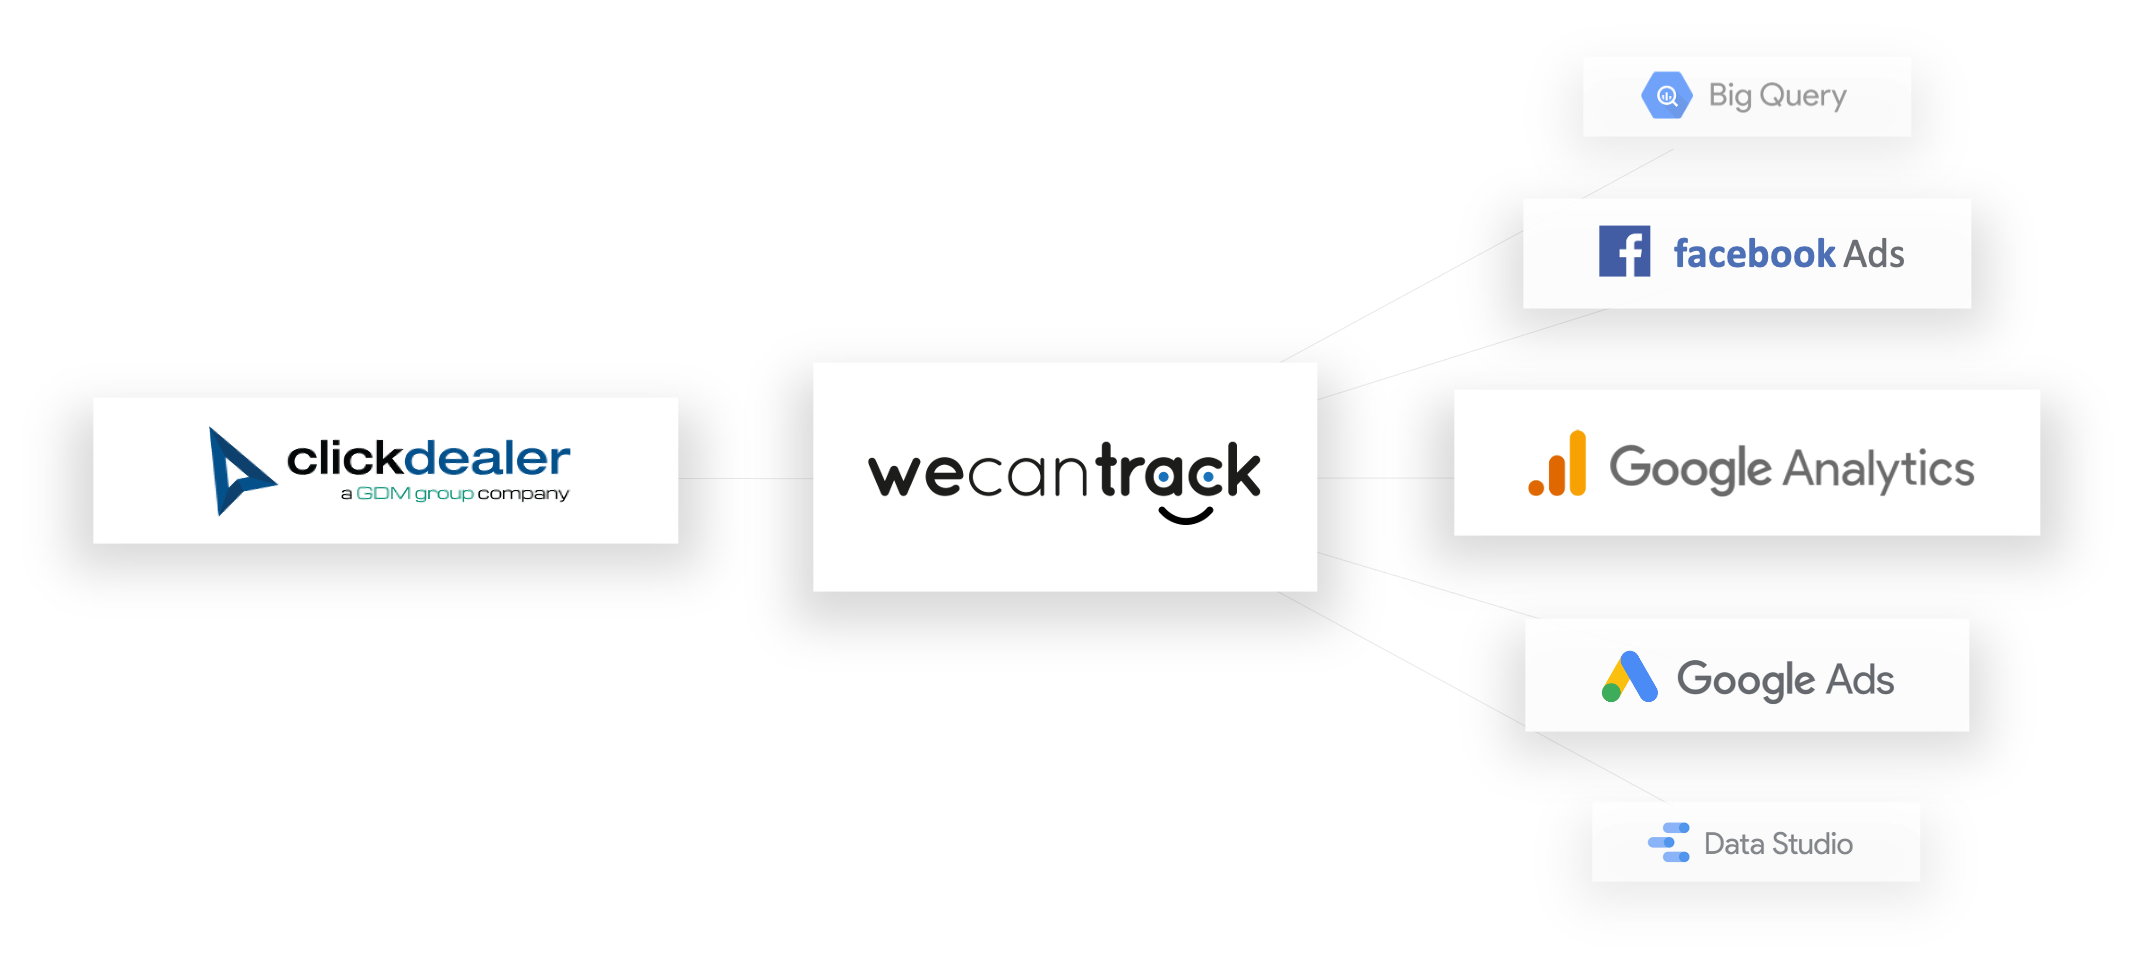 integrate-clickdealer-affiliate-conversions-via-postback